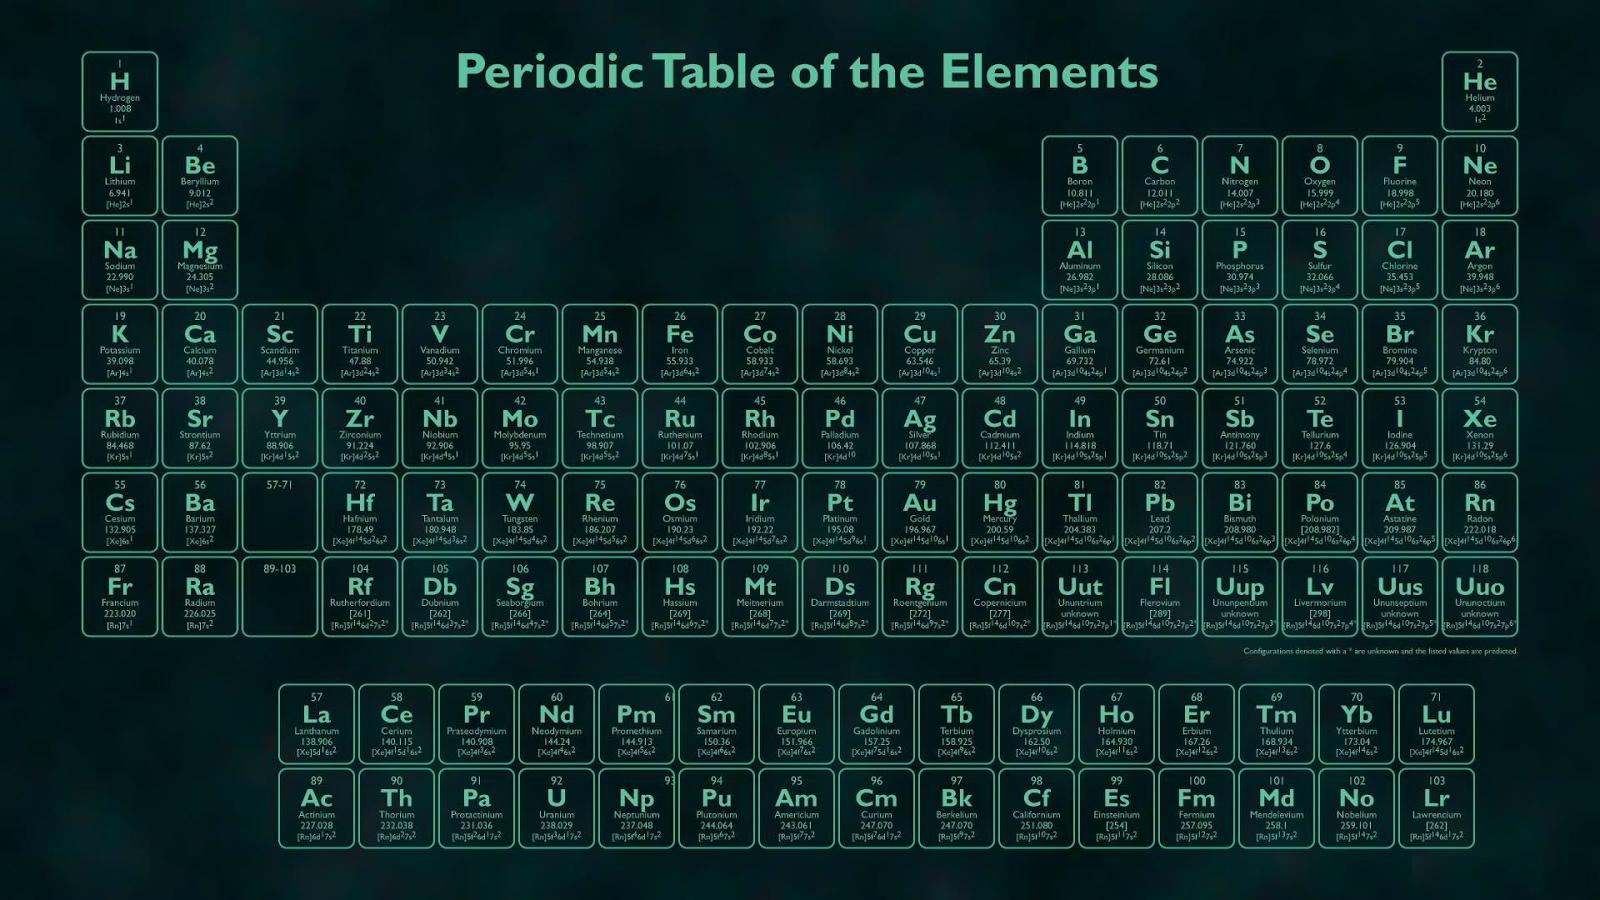 The periodic table wallpaper 10 apk download android wallpaper 10 screenshot 4 the periodic table wallpaper 10 screenshot 5 urtaz Images